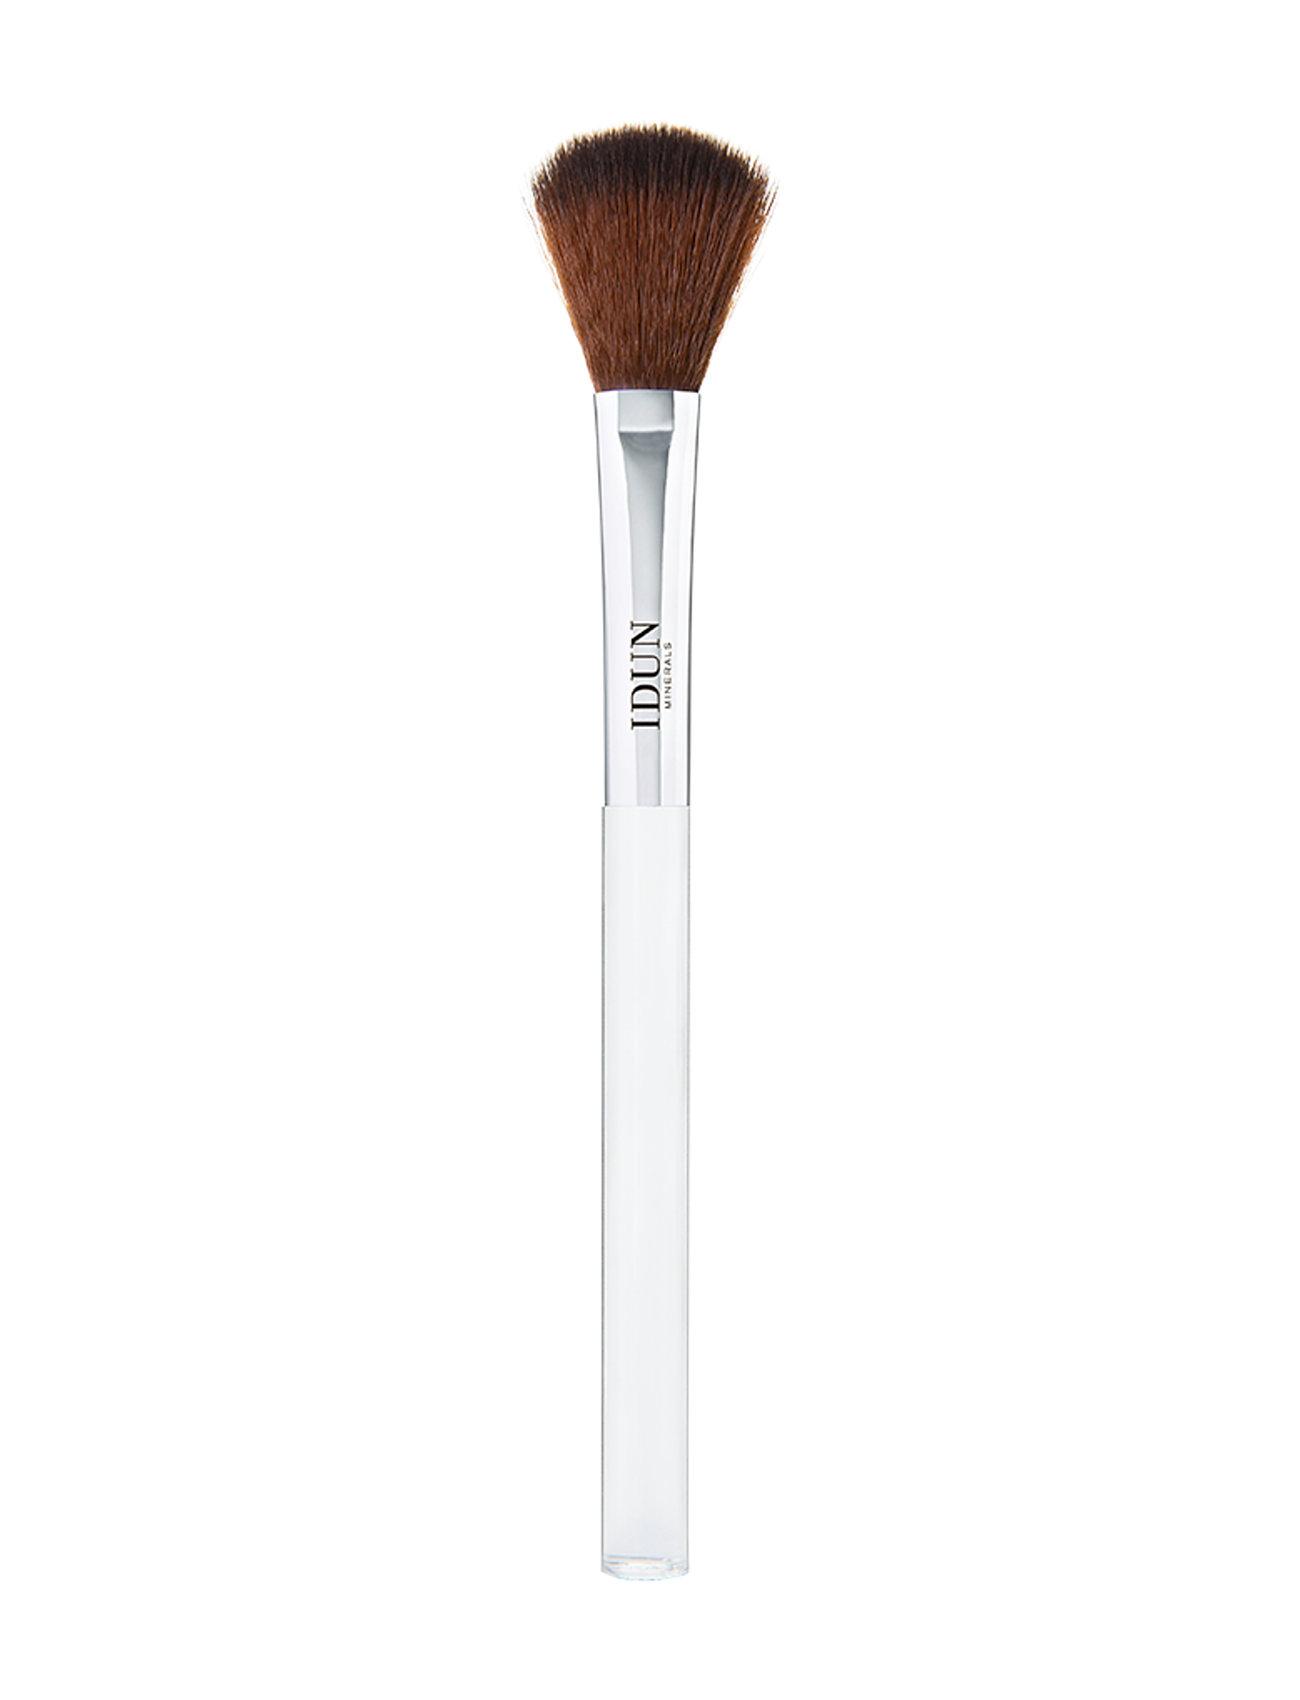 IDUN Minerals Face Definer Brush - CLEAR